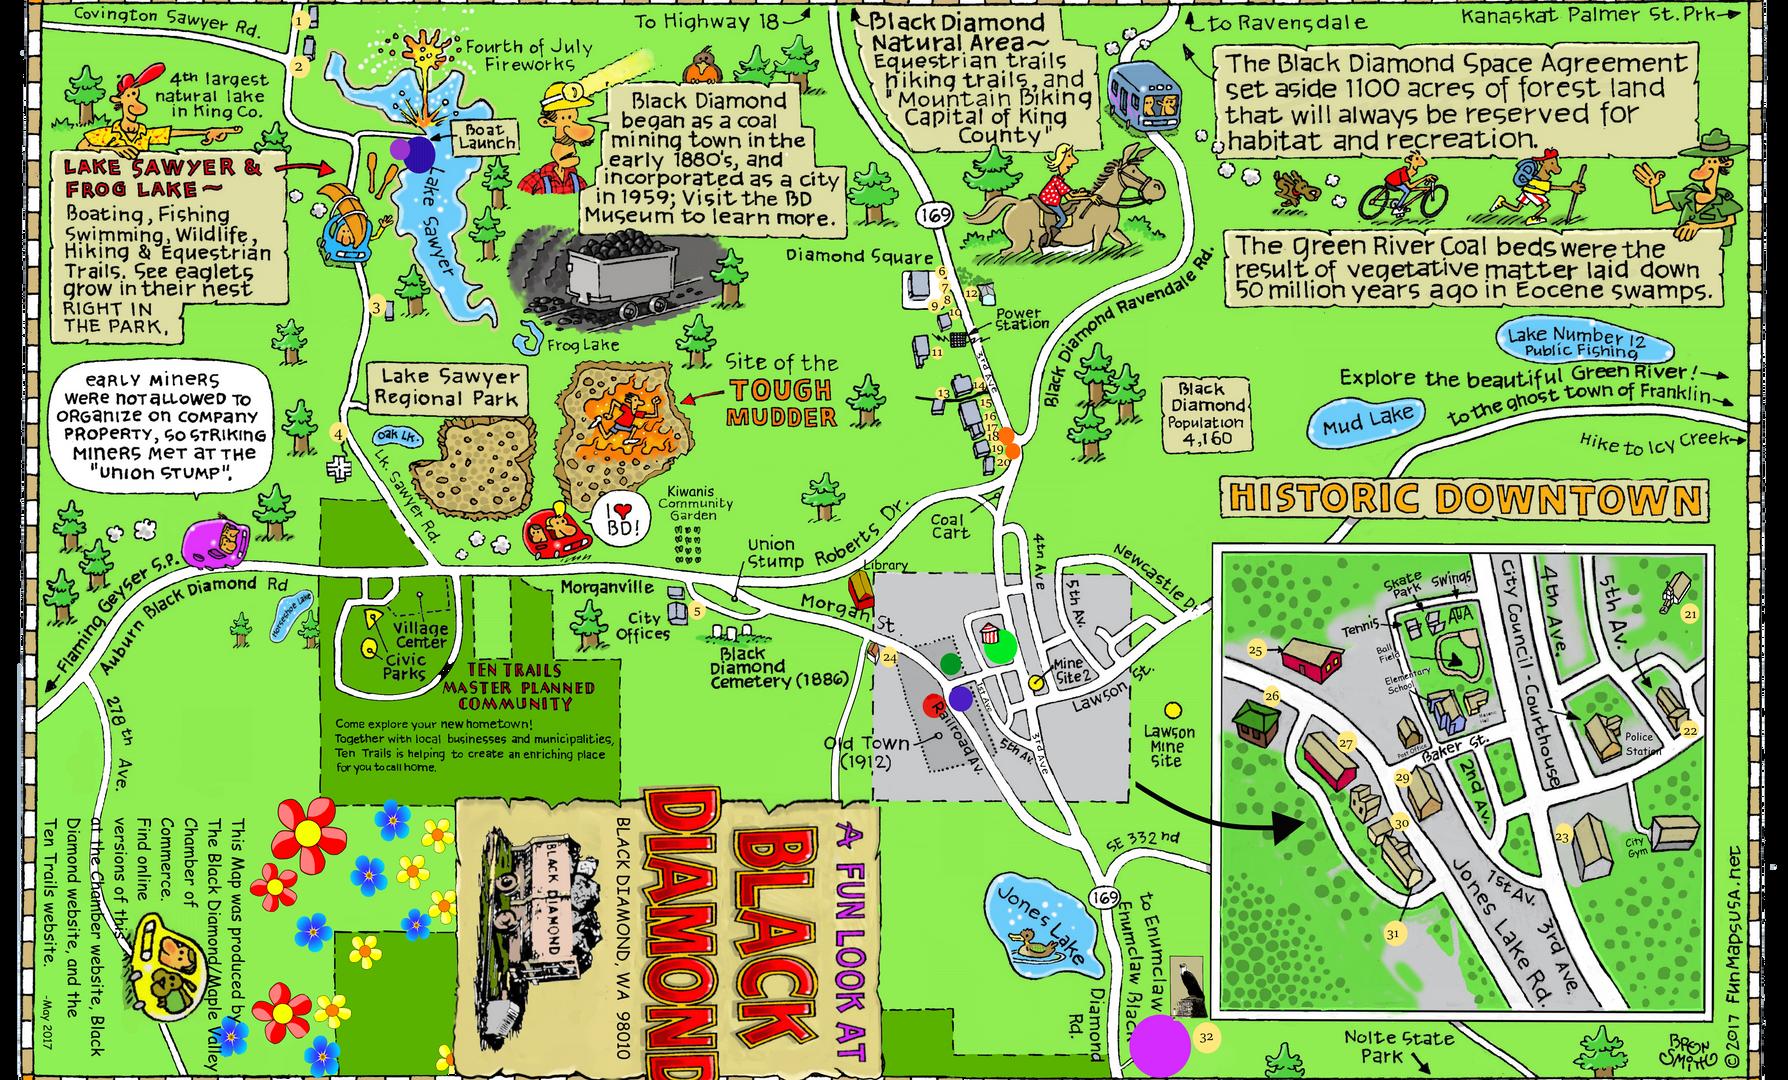 Community Map of Black Diamond